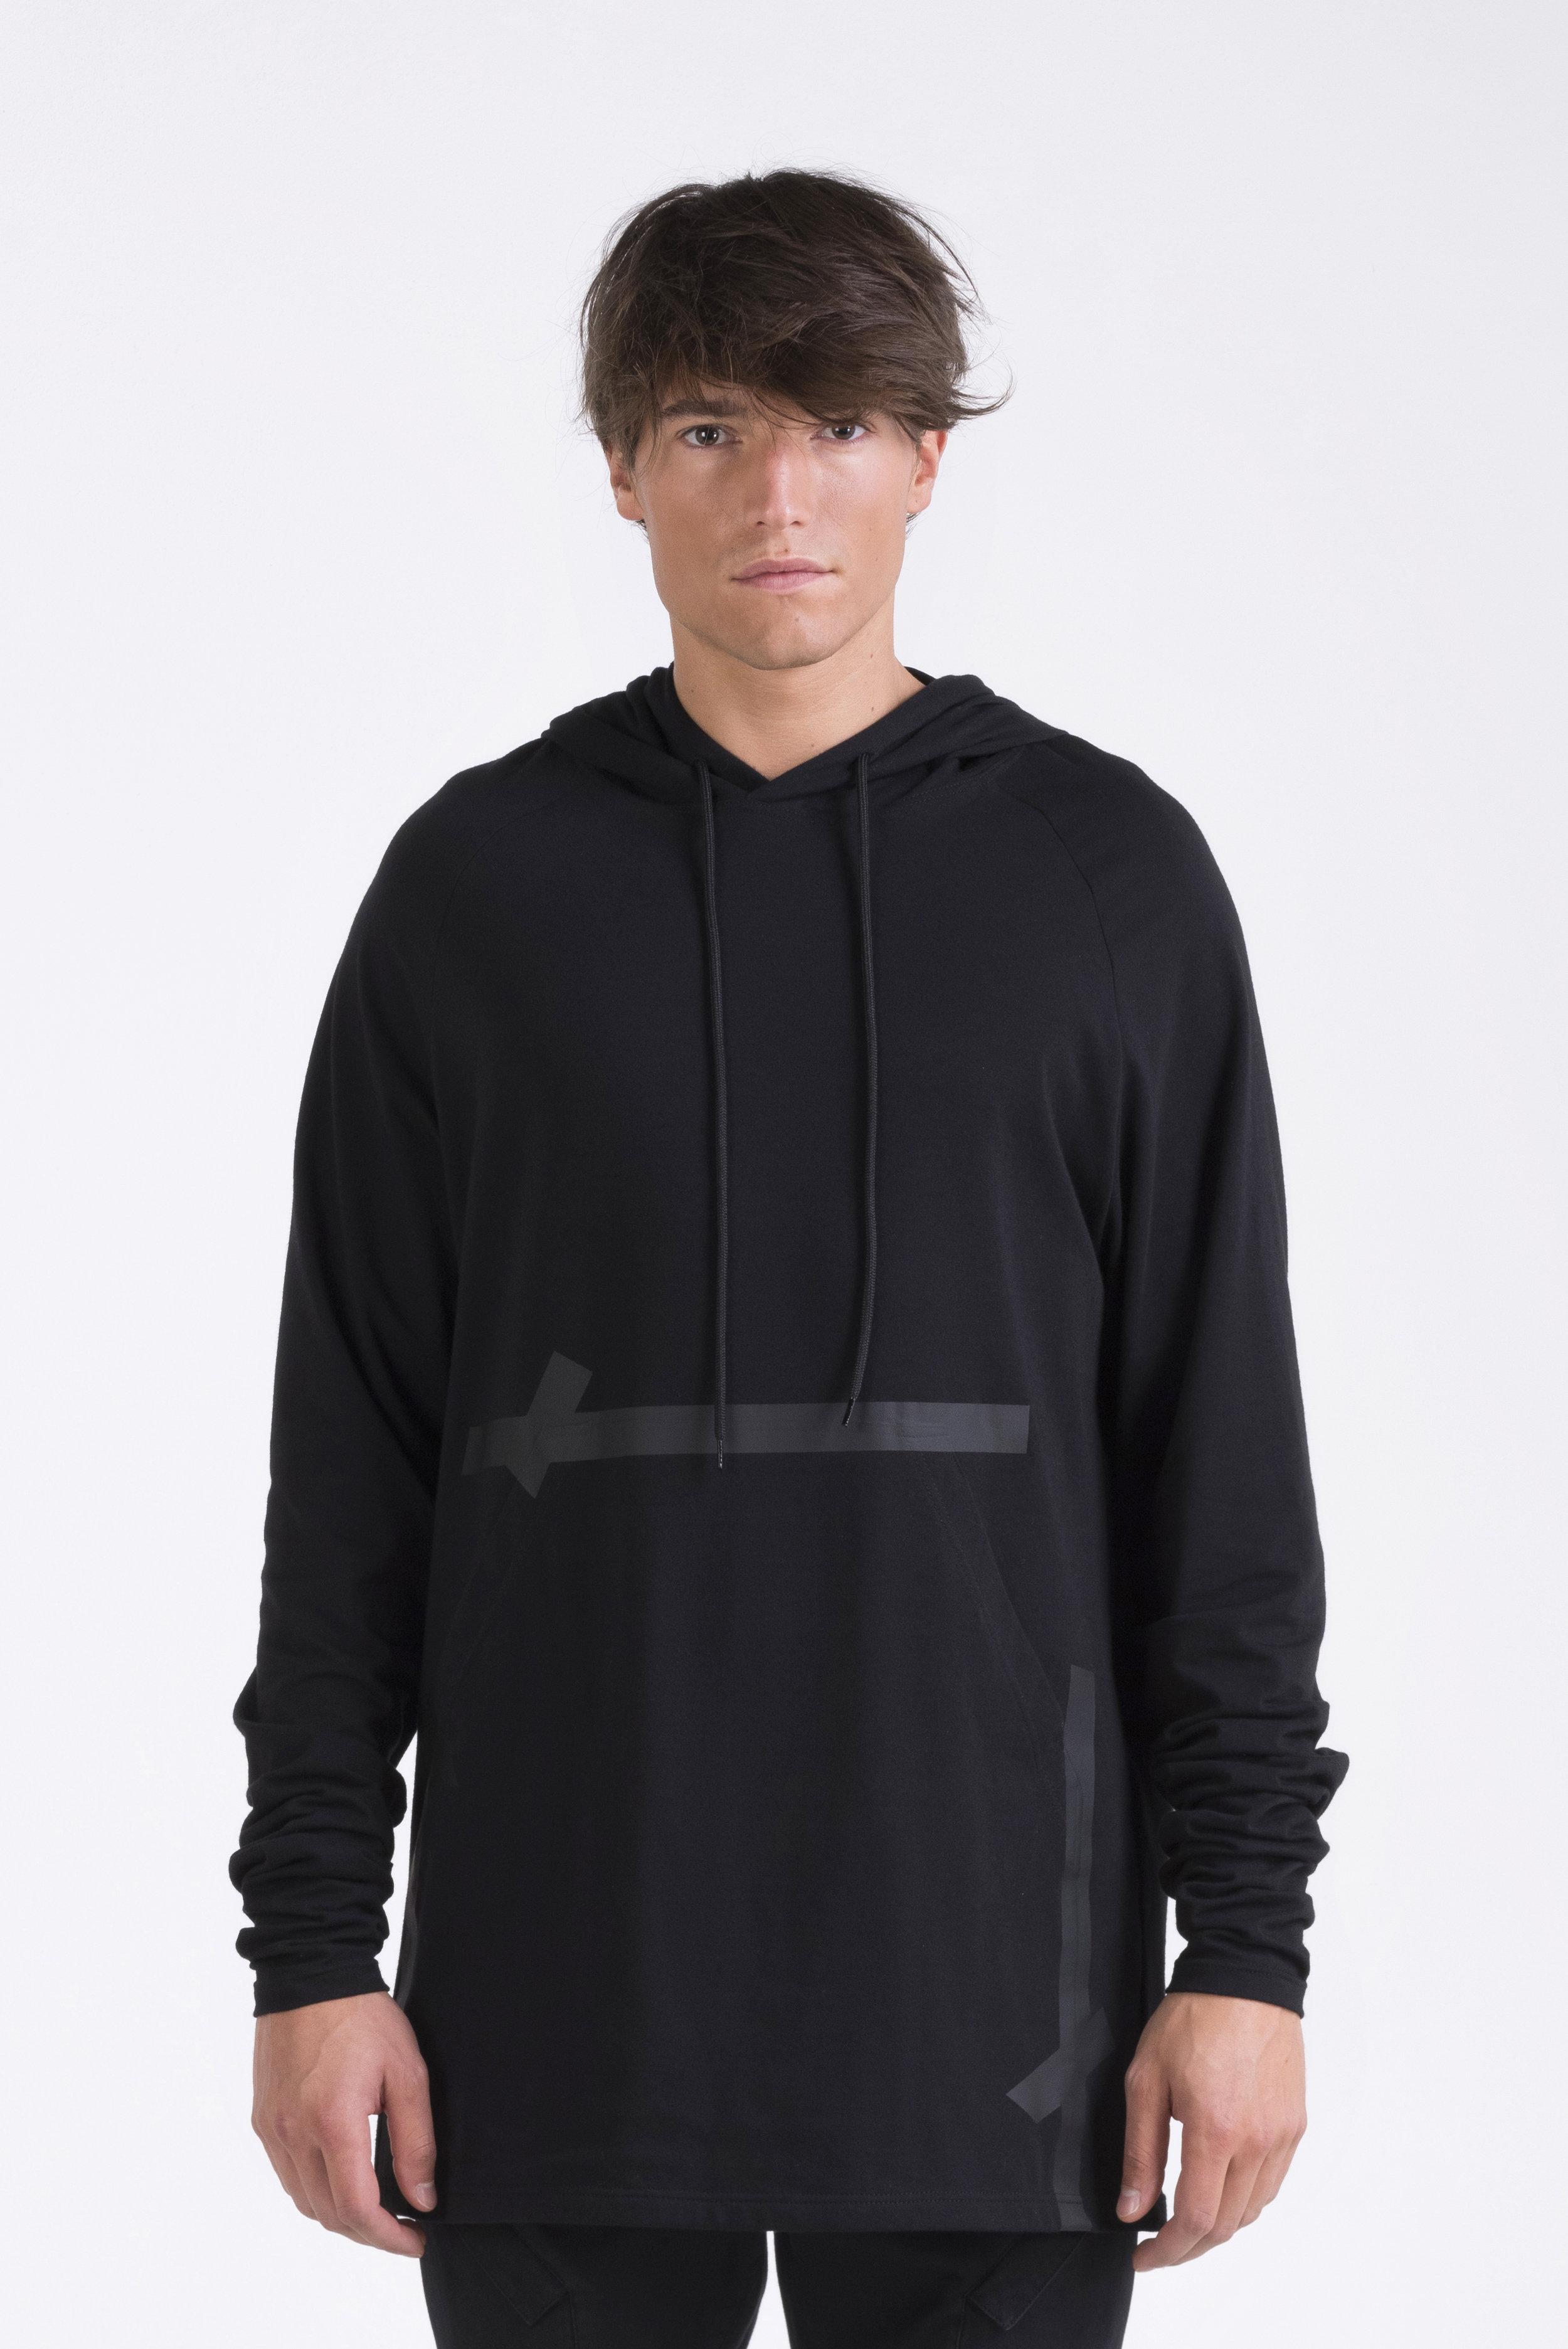 oneculture Oversized light hoodie black 2.jpg